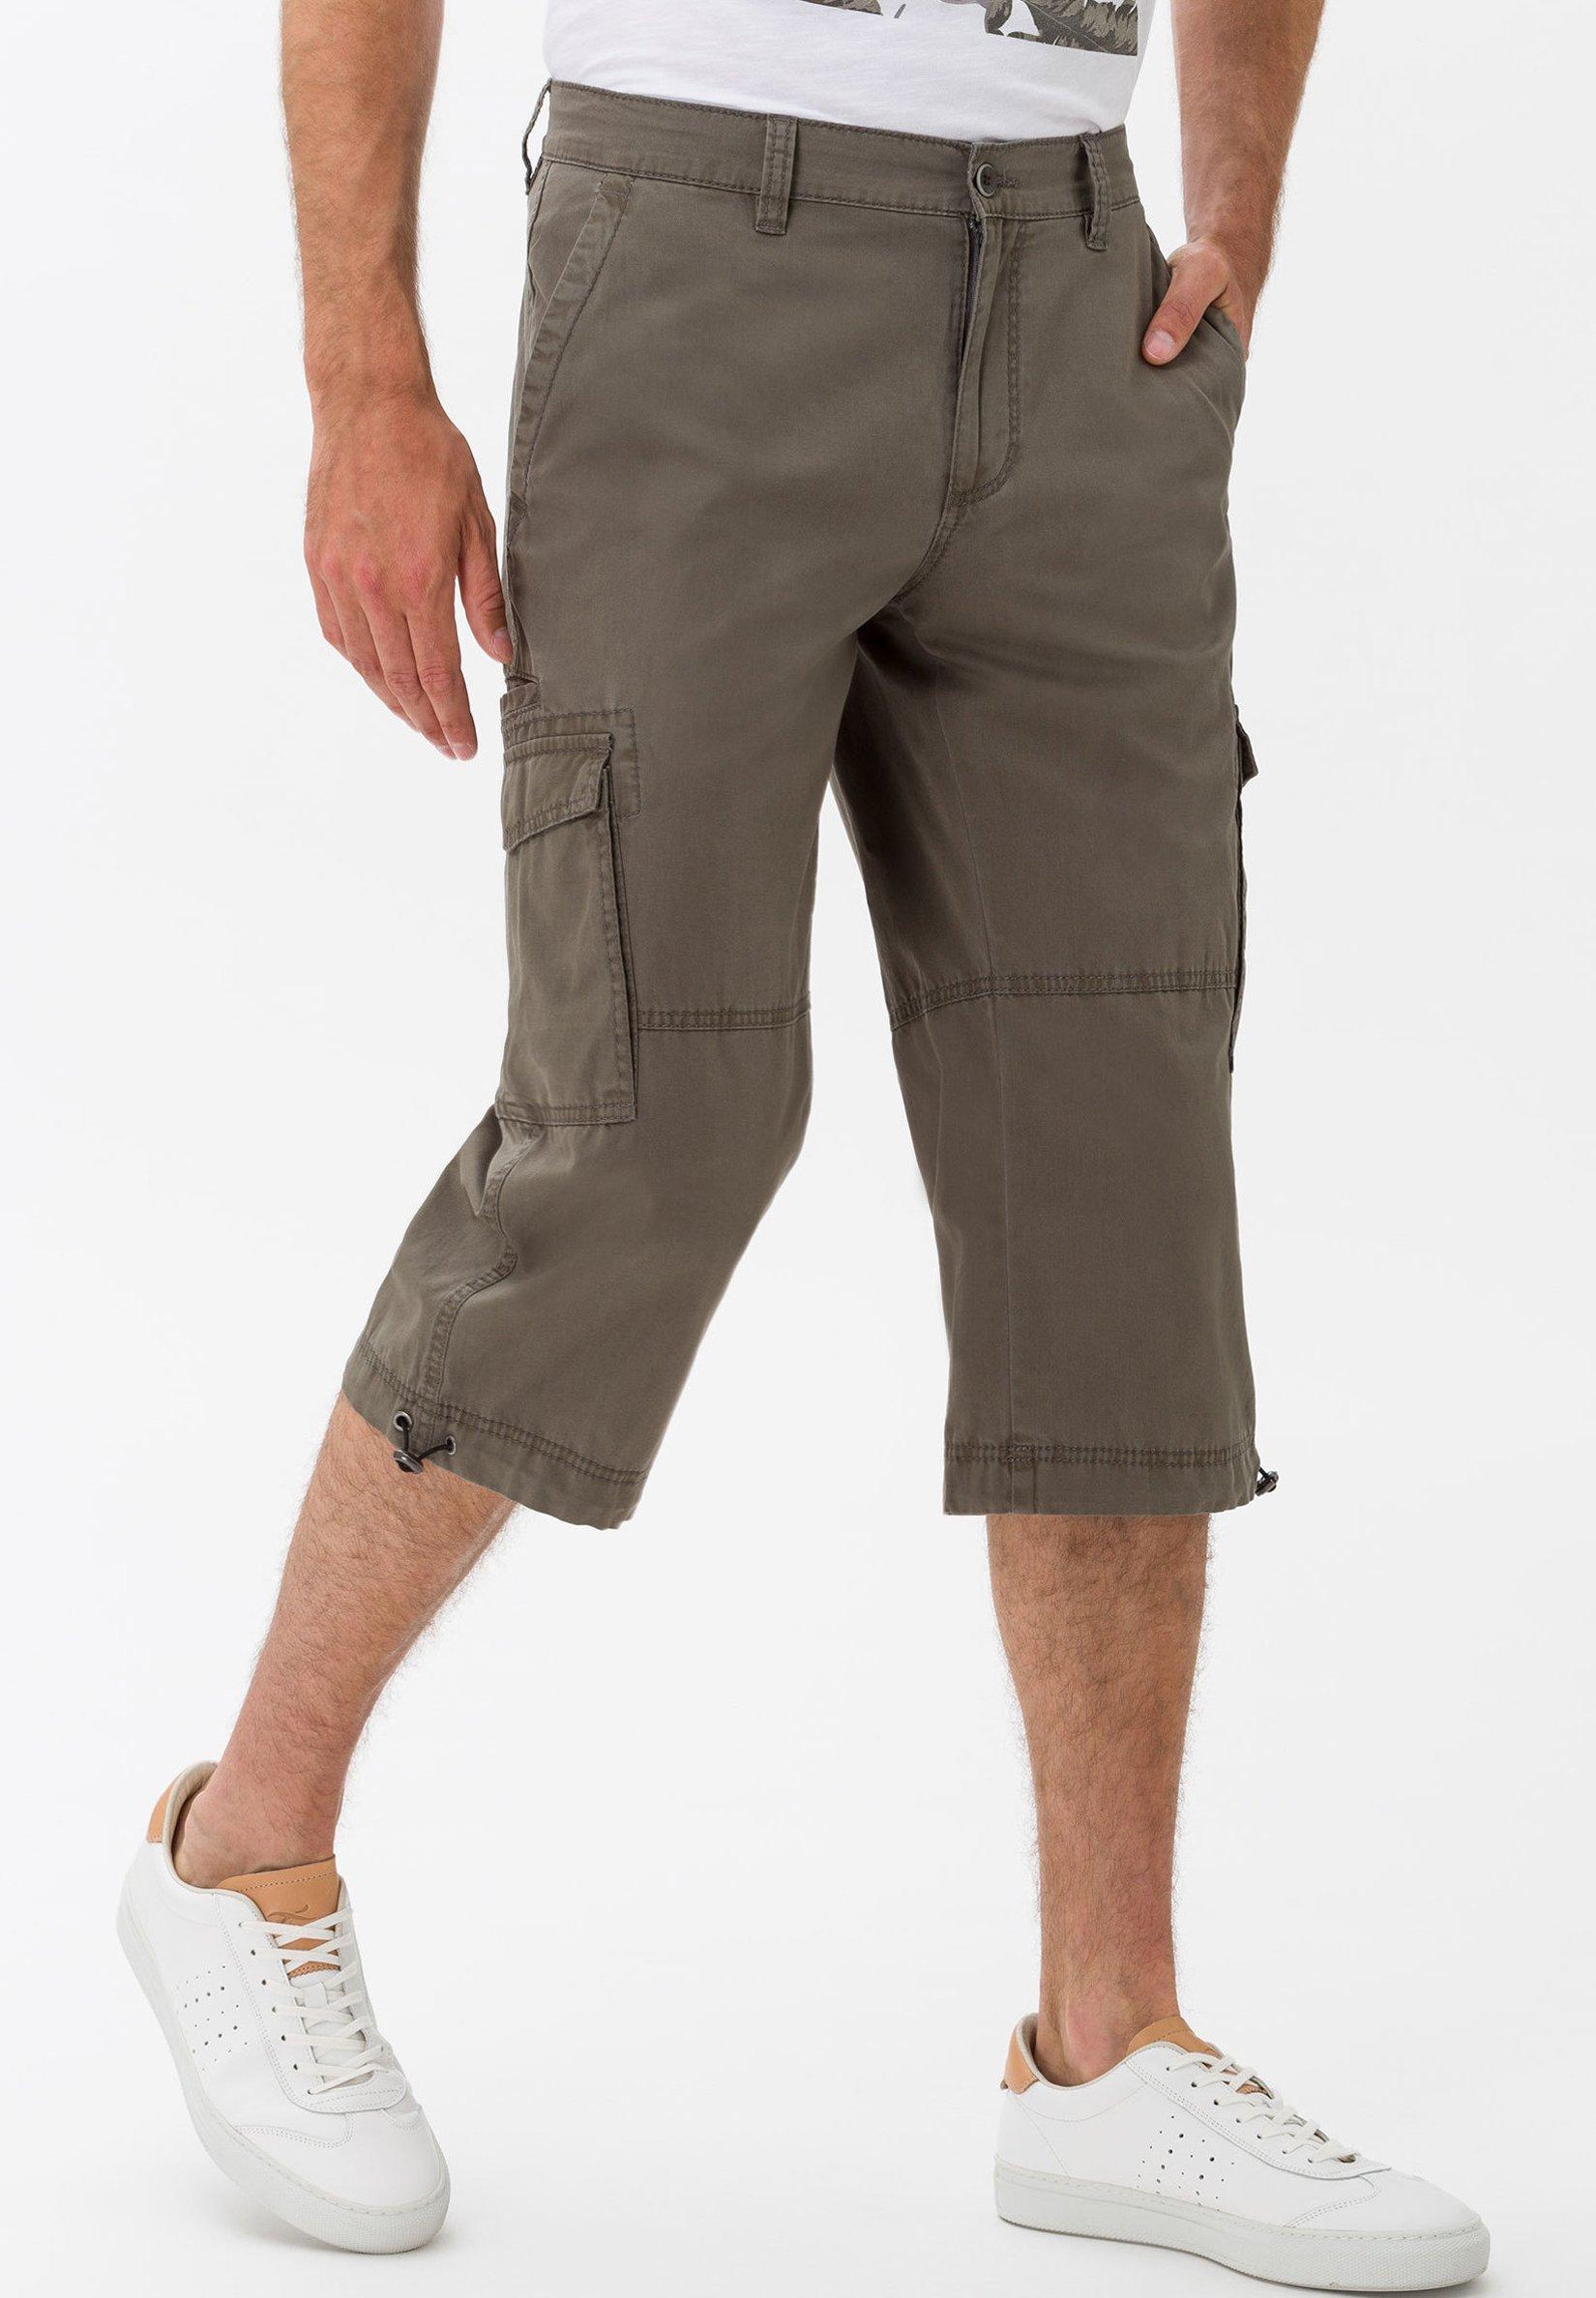 Homme STYLE LUCKY - Pantalon cargo